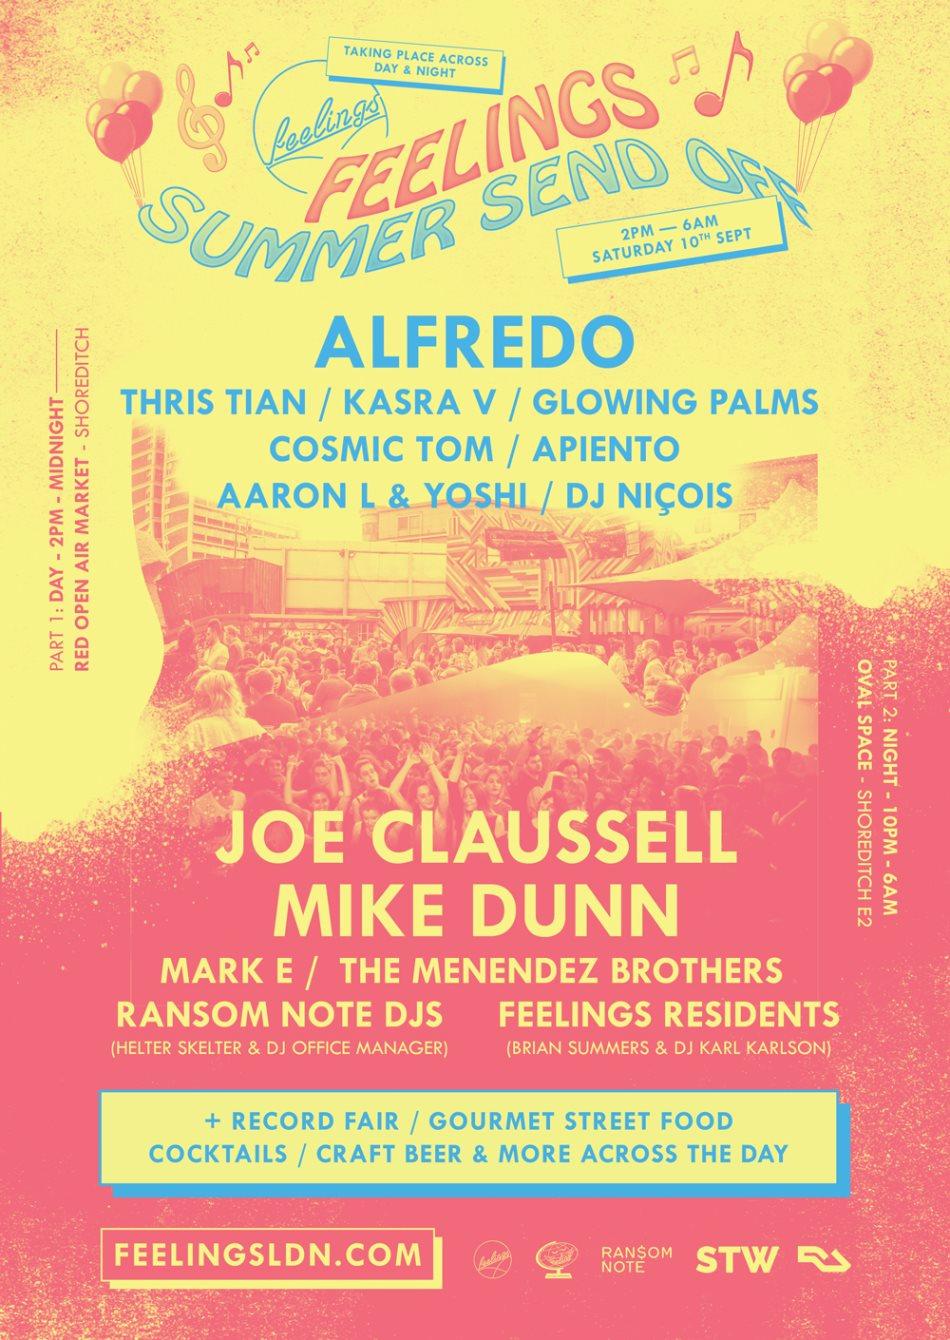 Feelings Summer Send Off - Flyer front